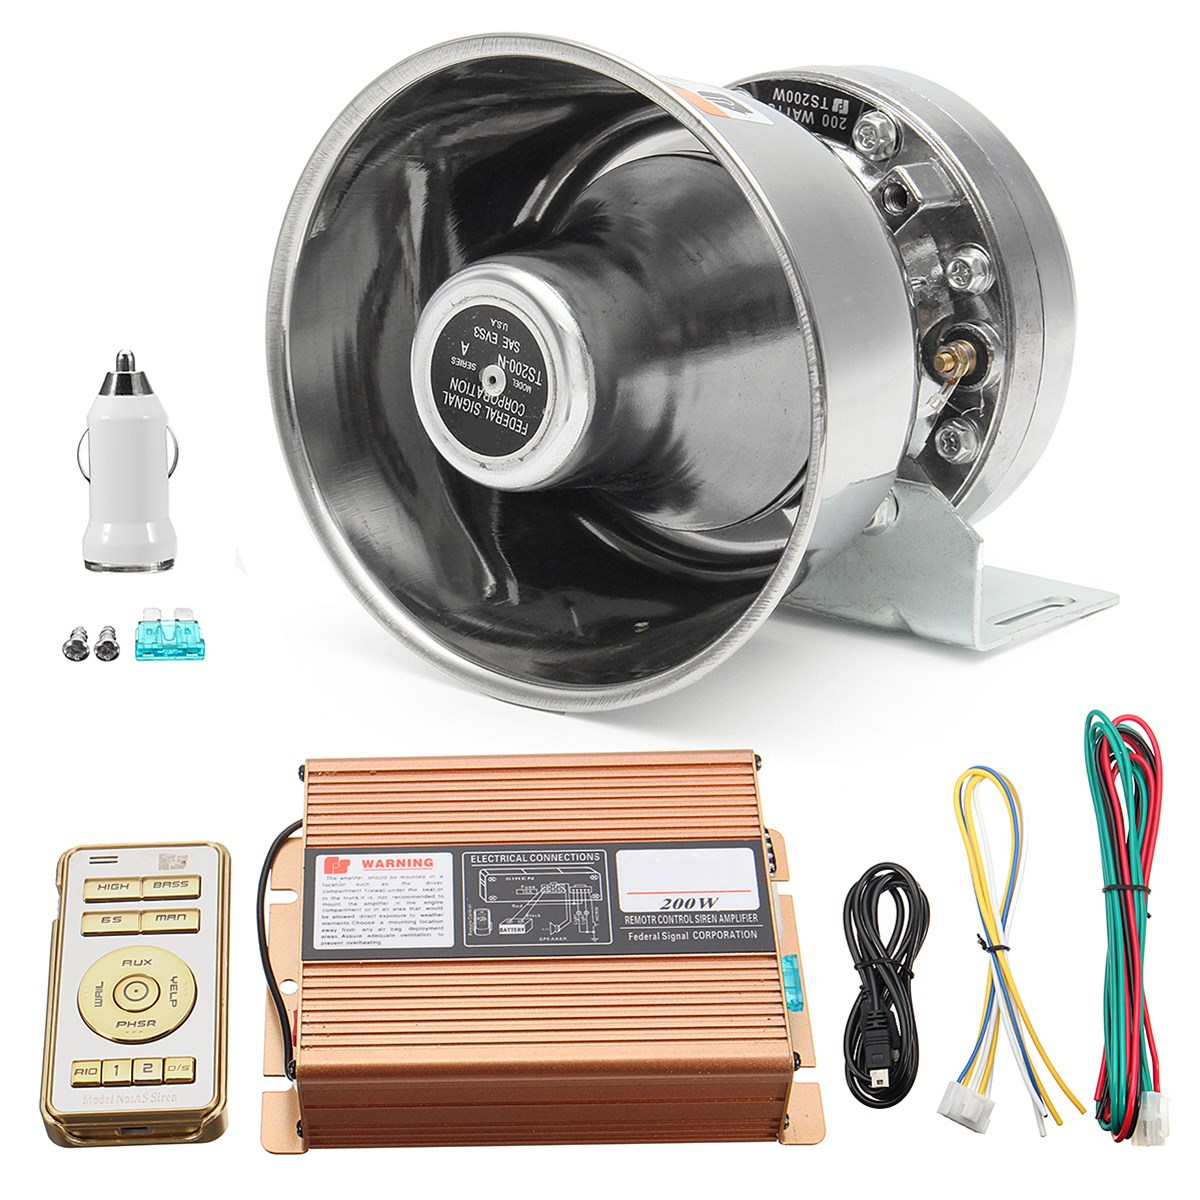 200W Car 8 Sound Loud Warning Alarm Police Fire Siren Horn Speaker MIC SystemKit